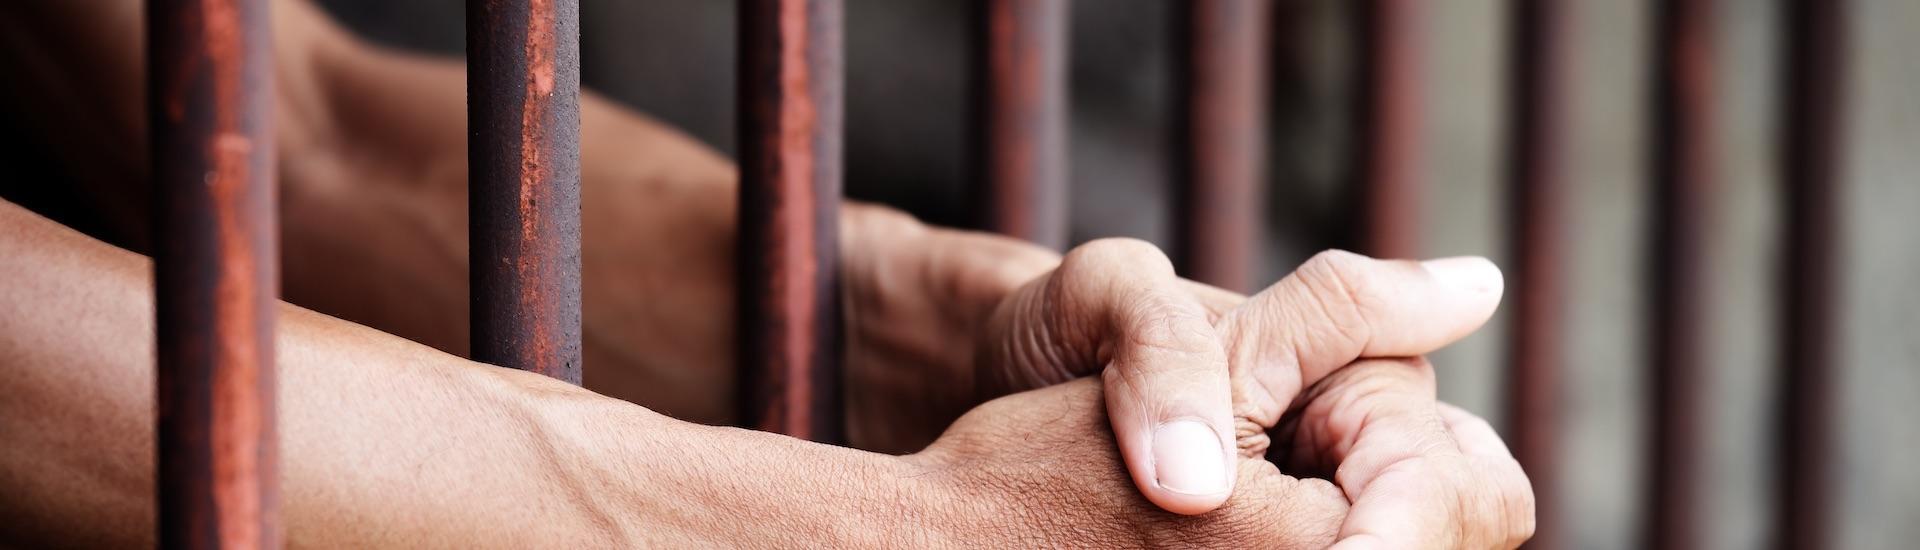 Hands In Prison Bars